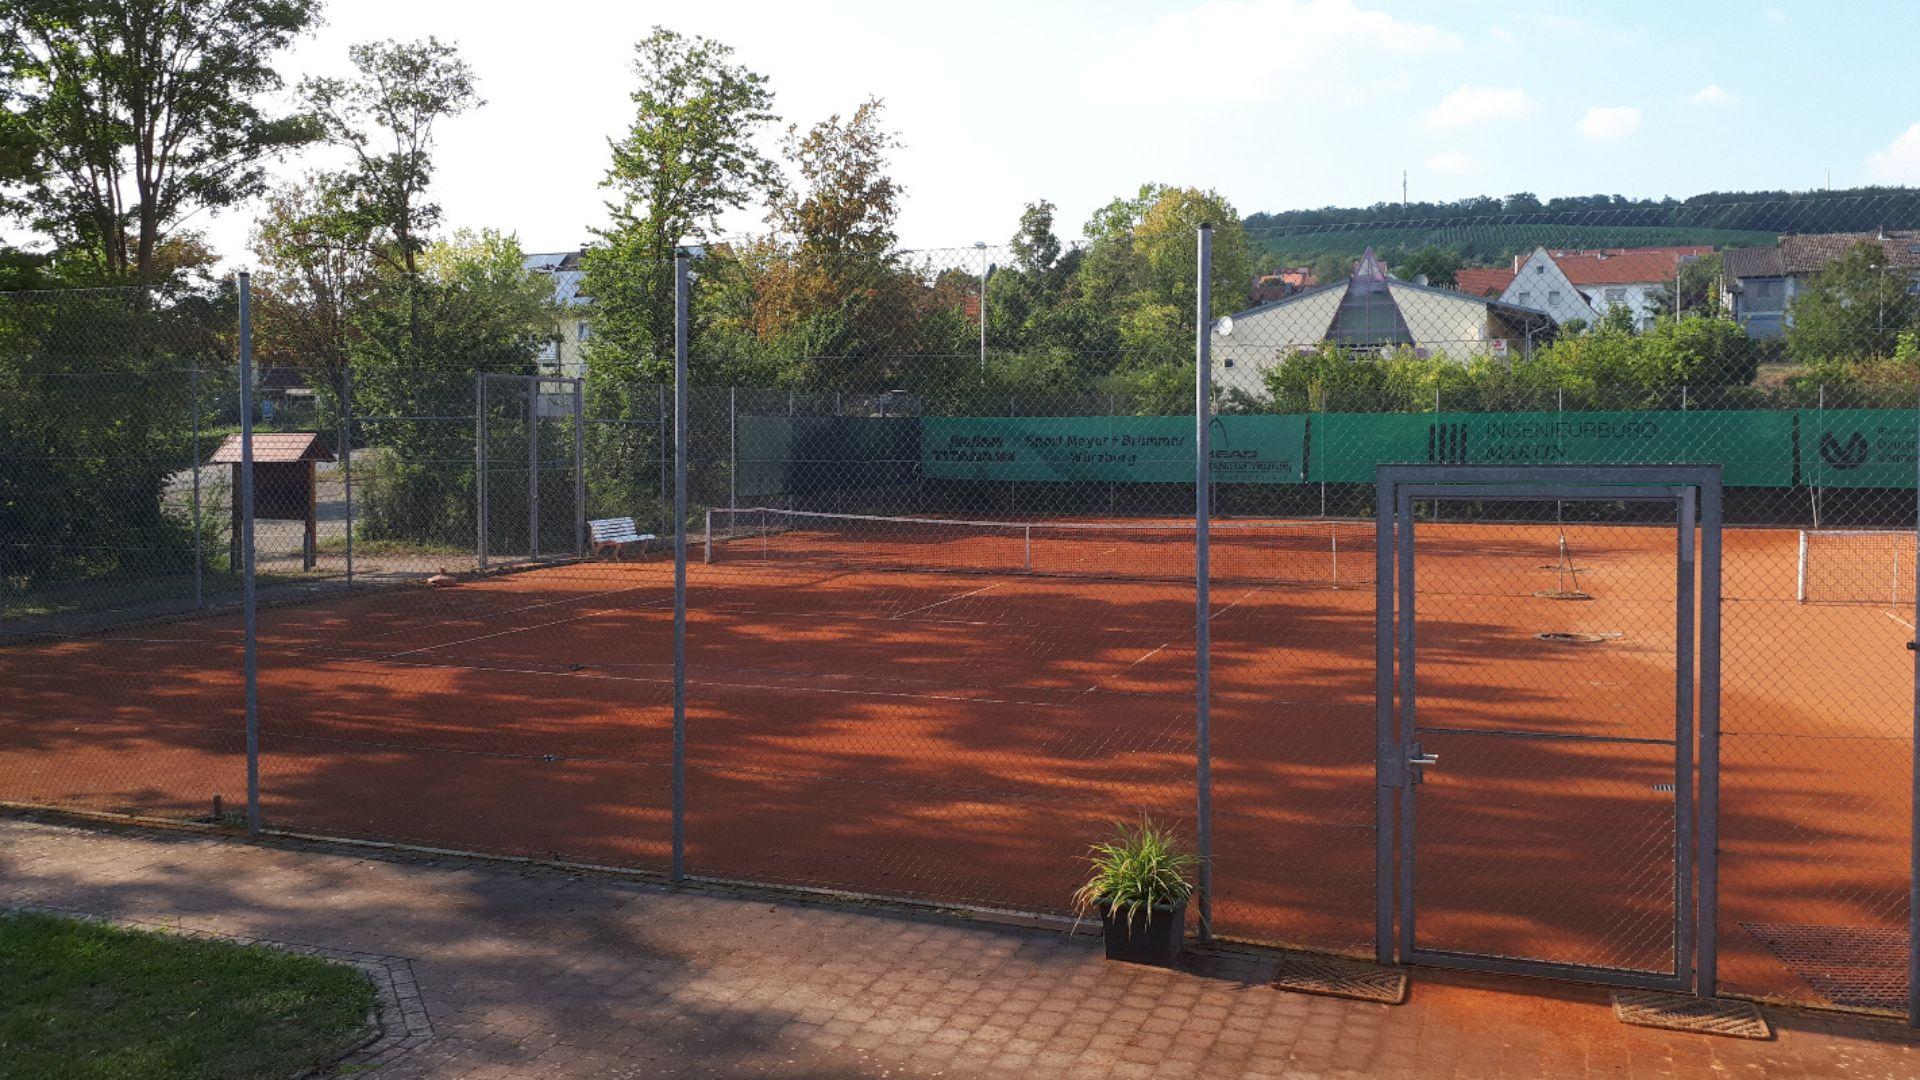 Tennis - Platz 1